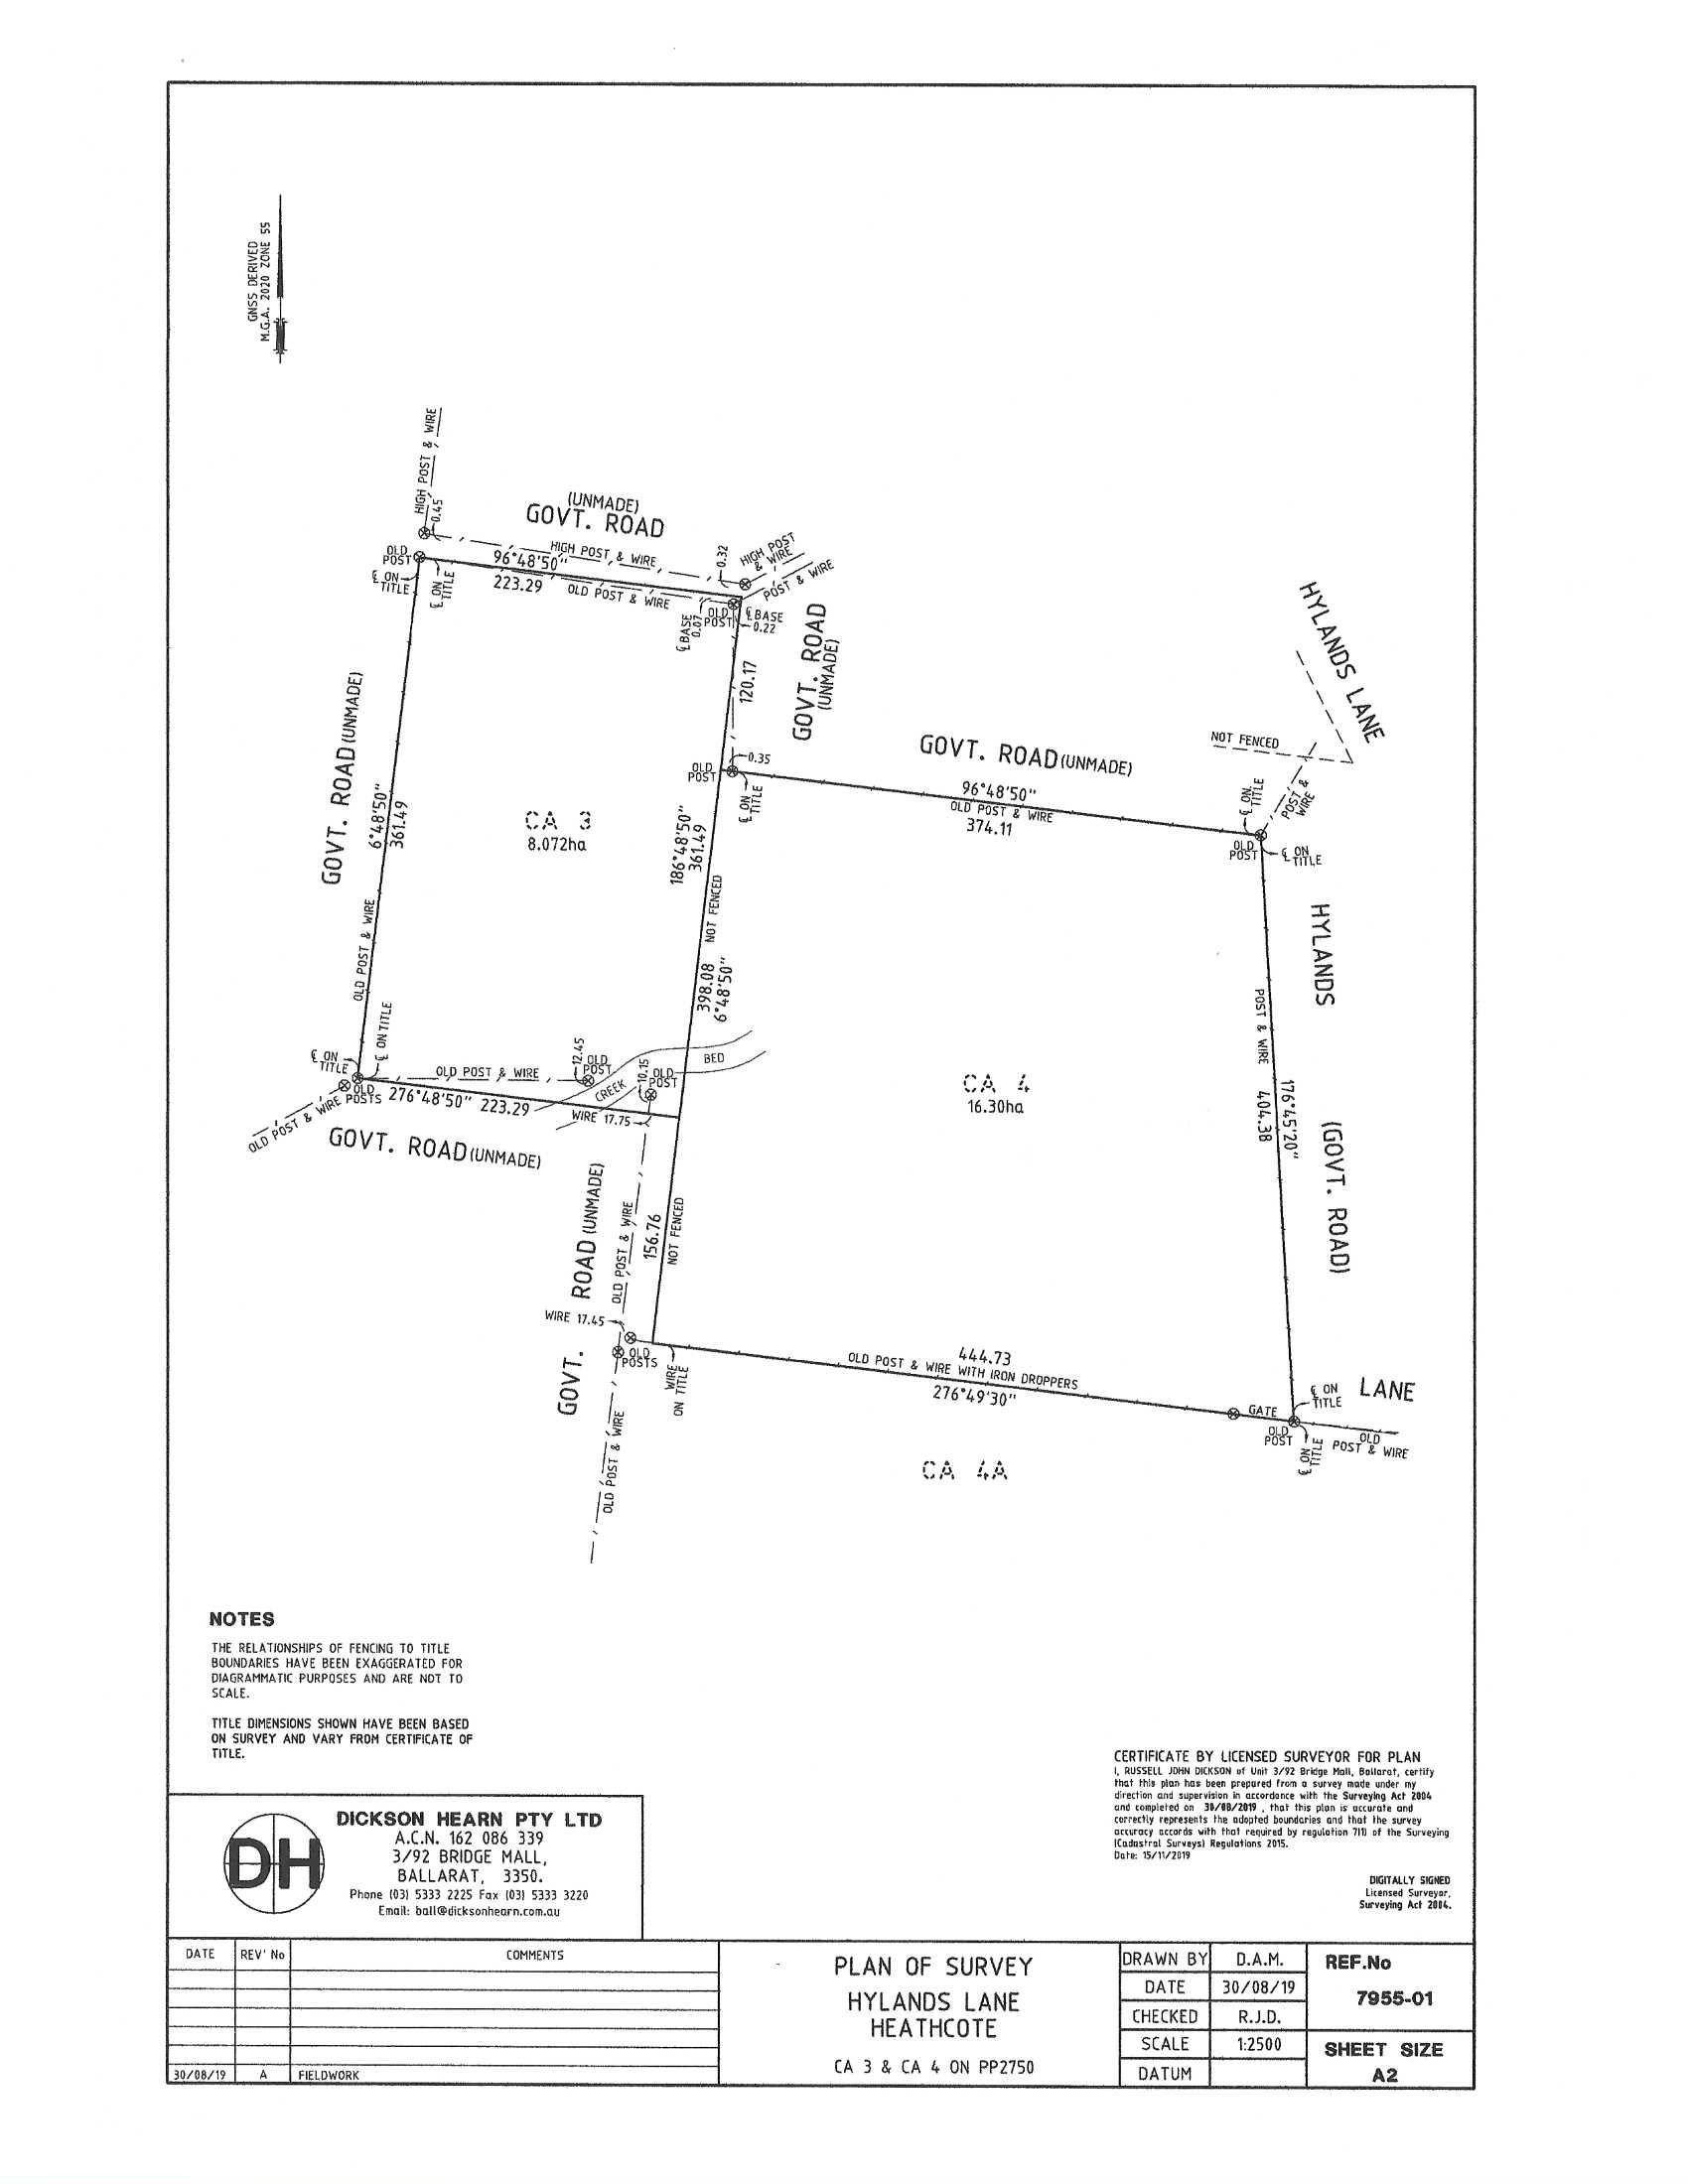 C/A 4/ Hylands Lane, Heathcote VIC 3523